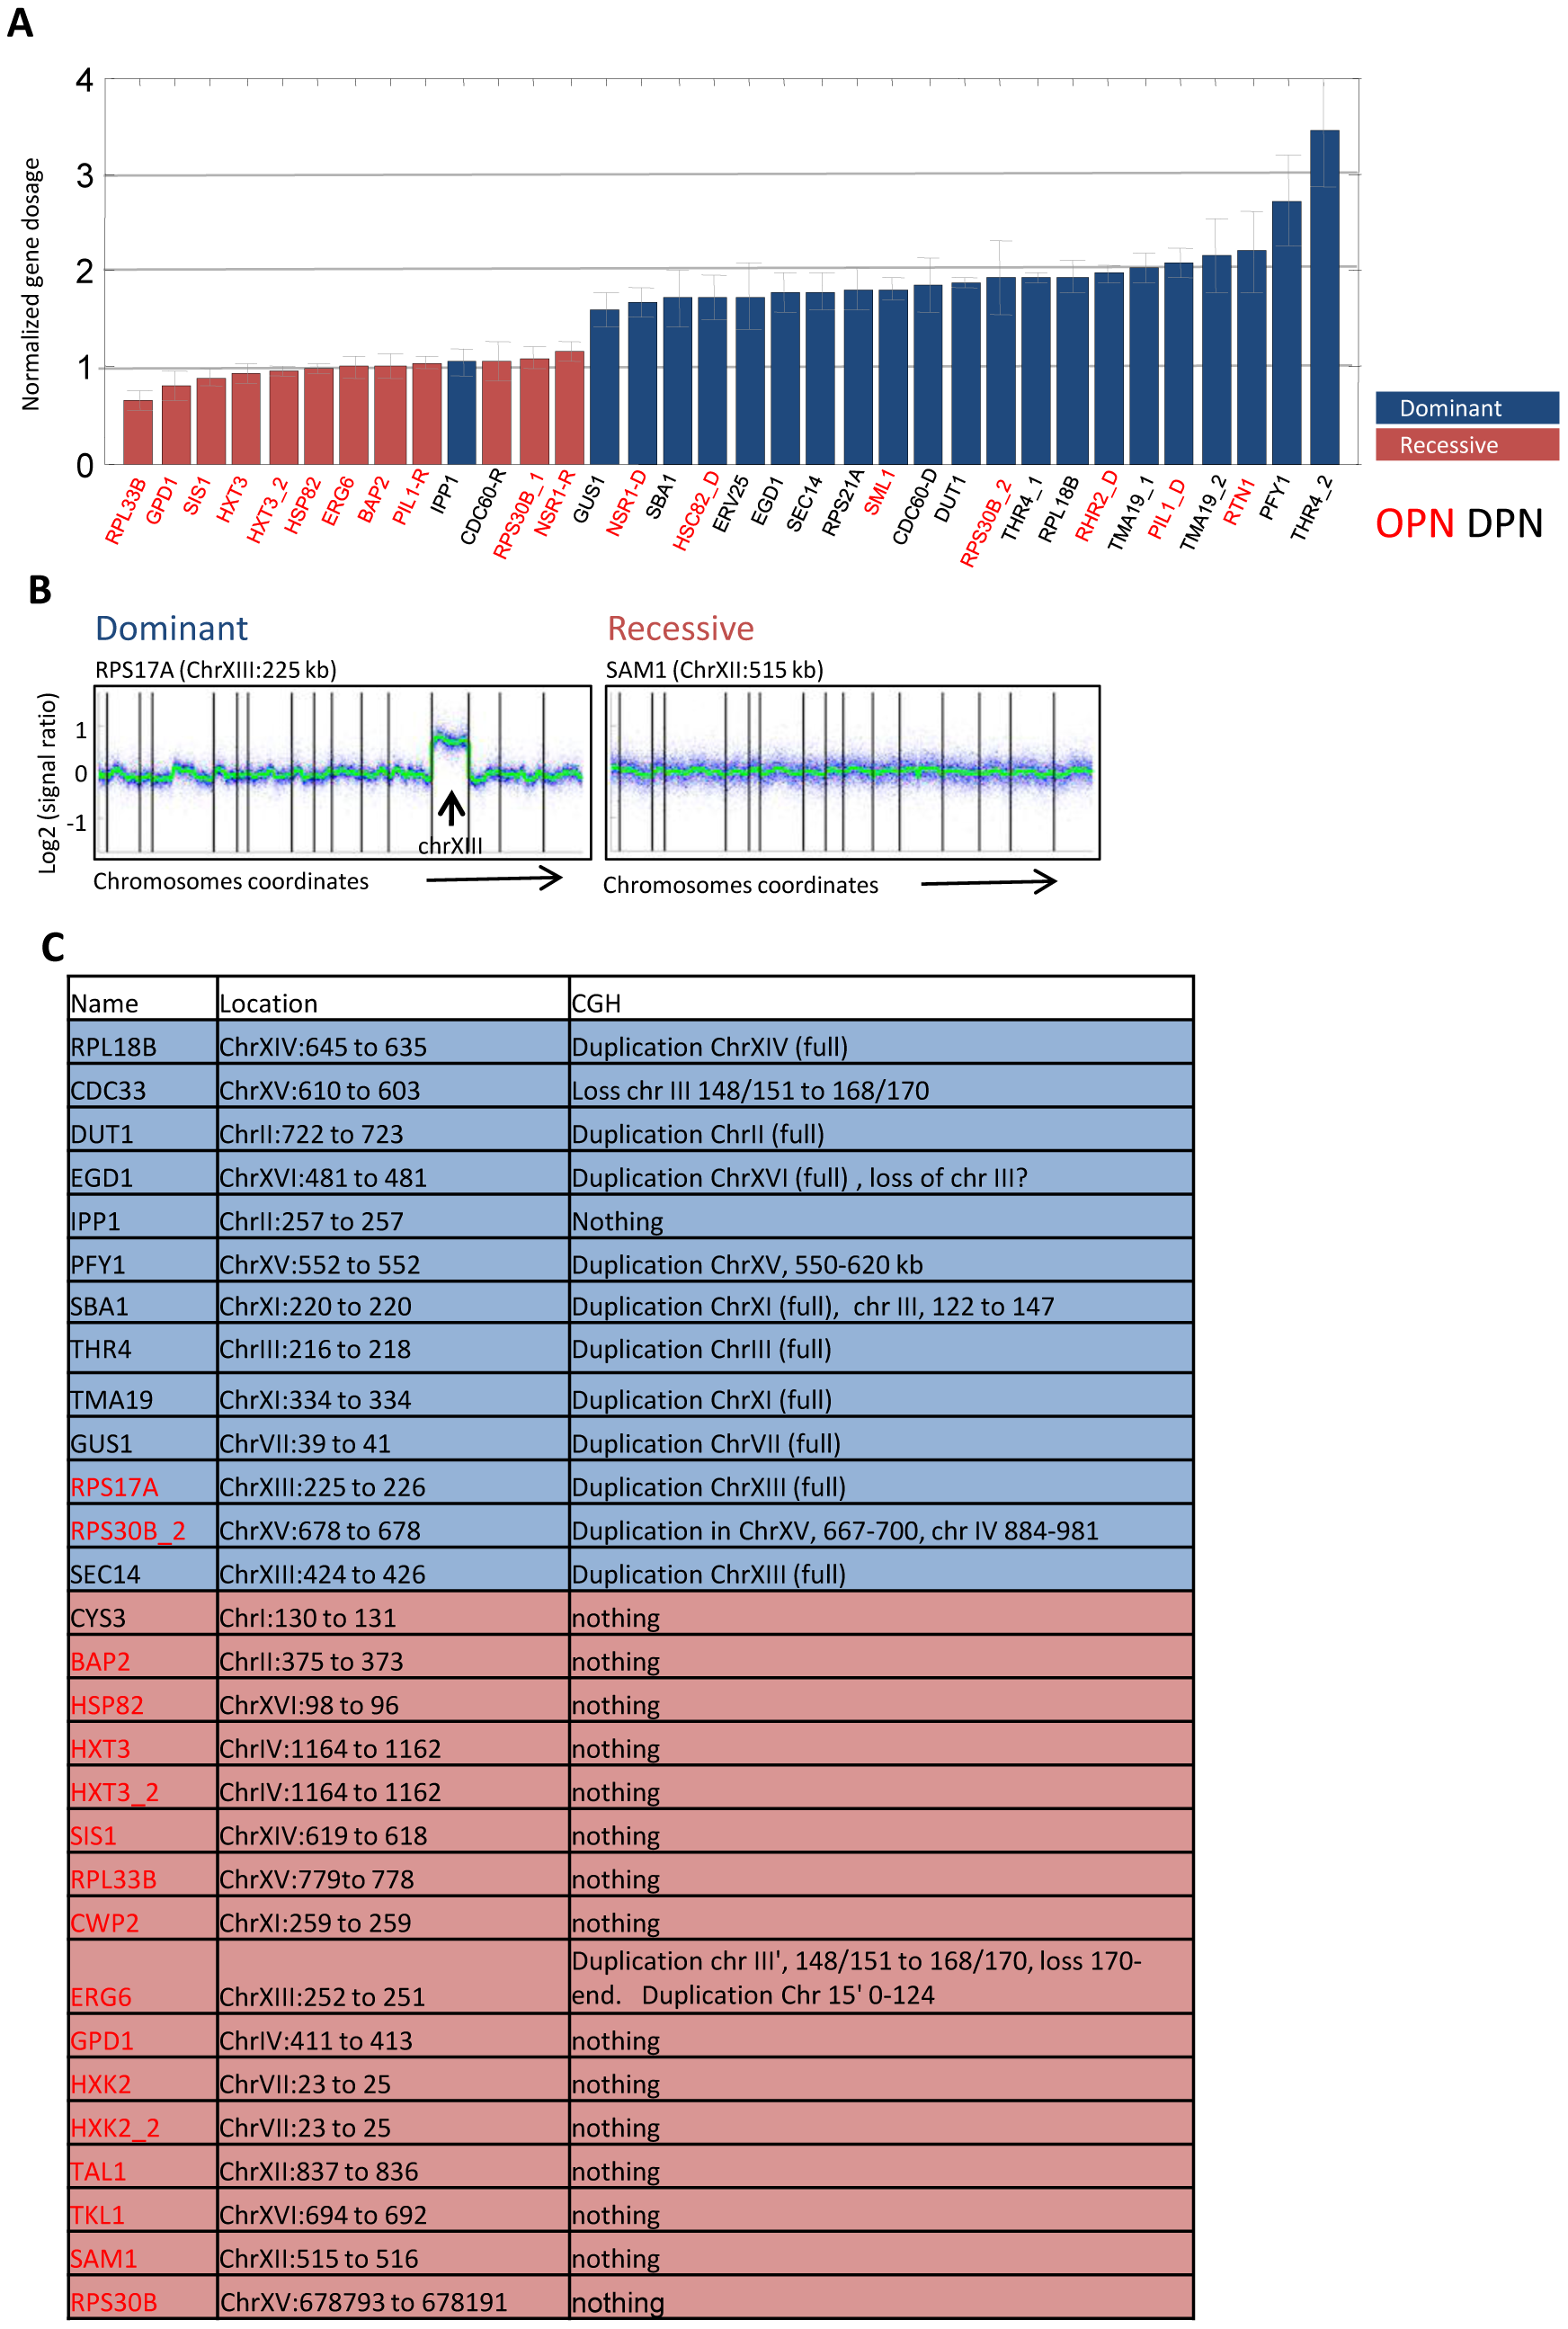 Dominant mutations involve large-scale genomic duplications.